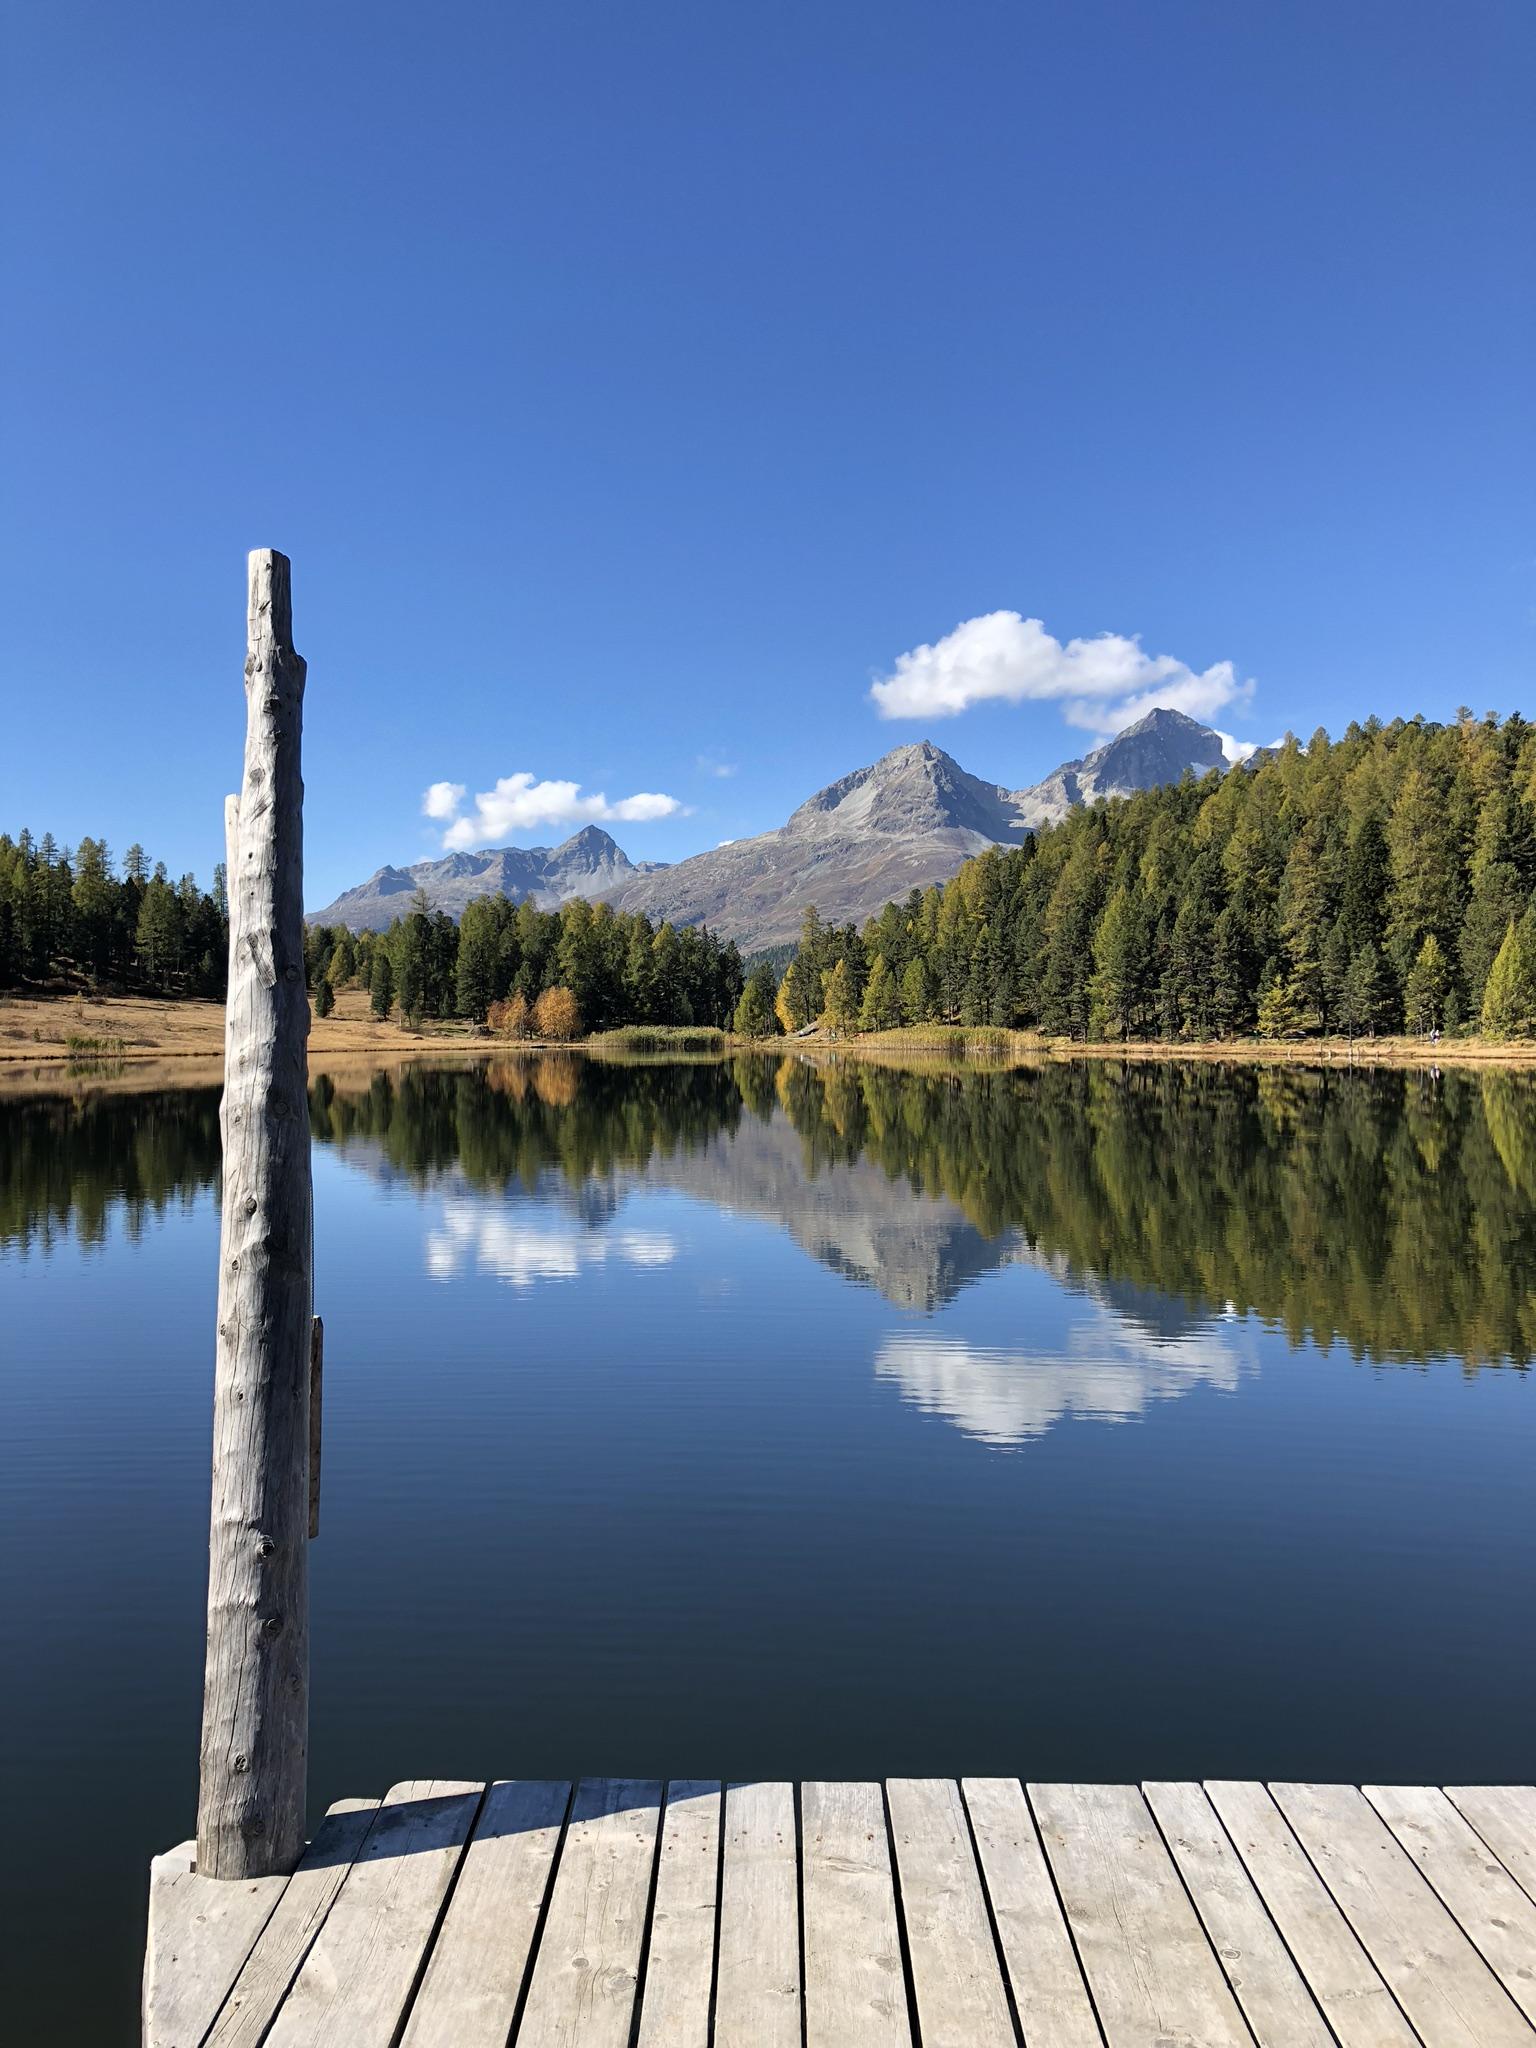 Stazersee, St. Moritz (Foto © Tom Pellny)